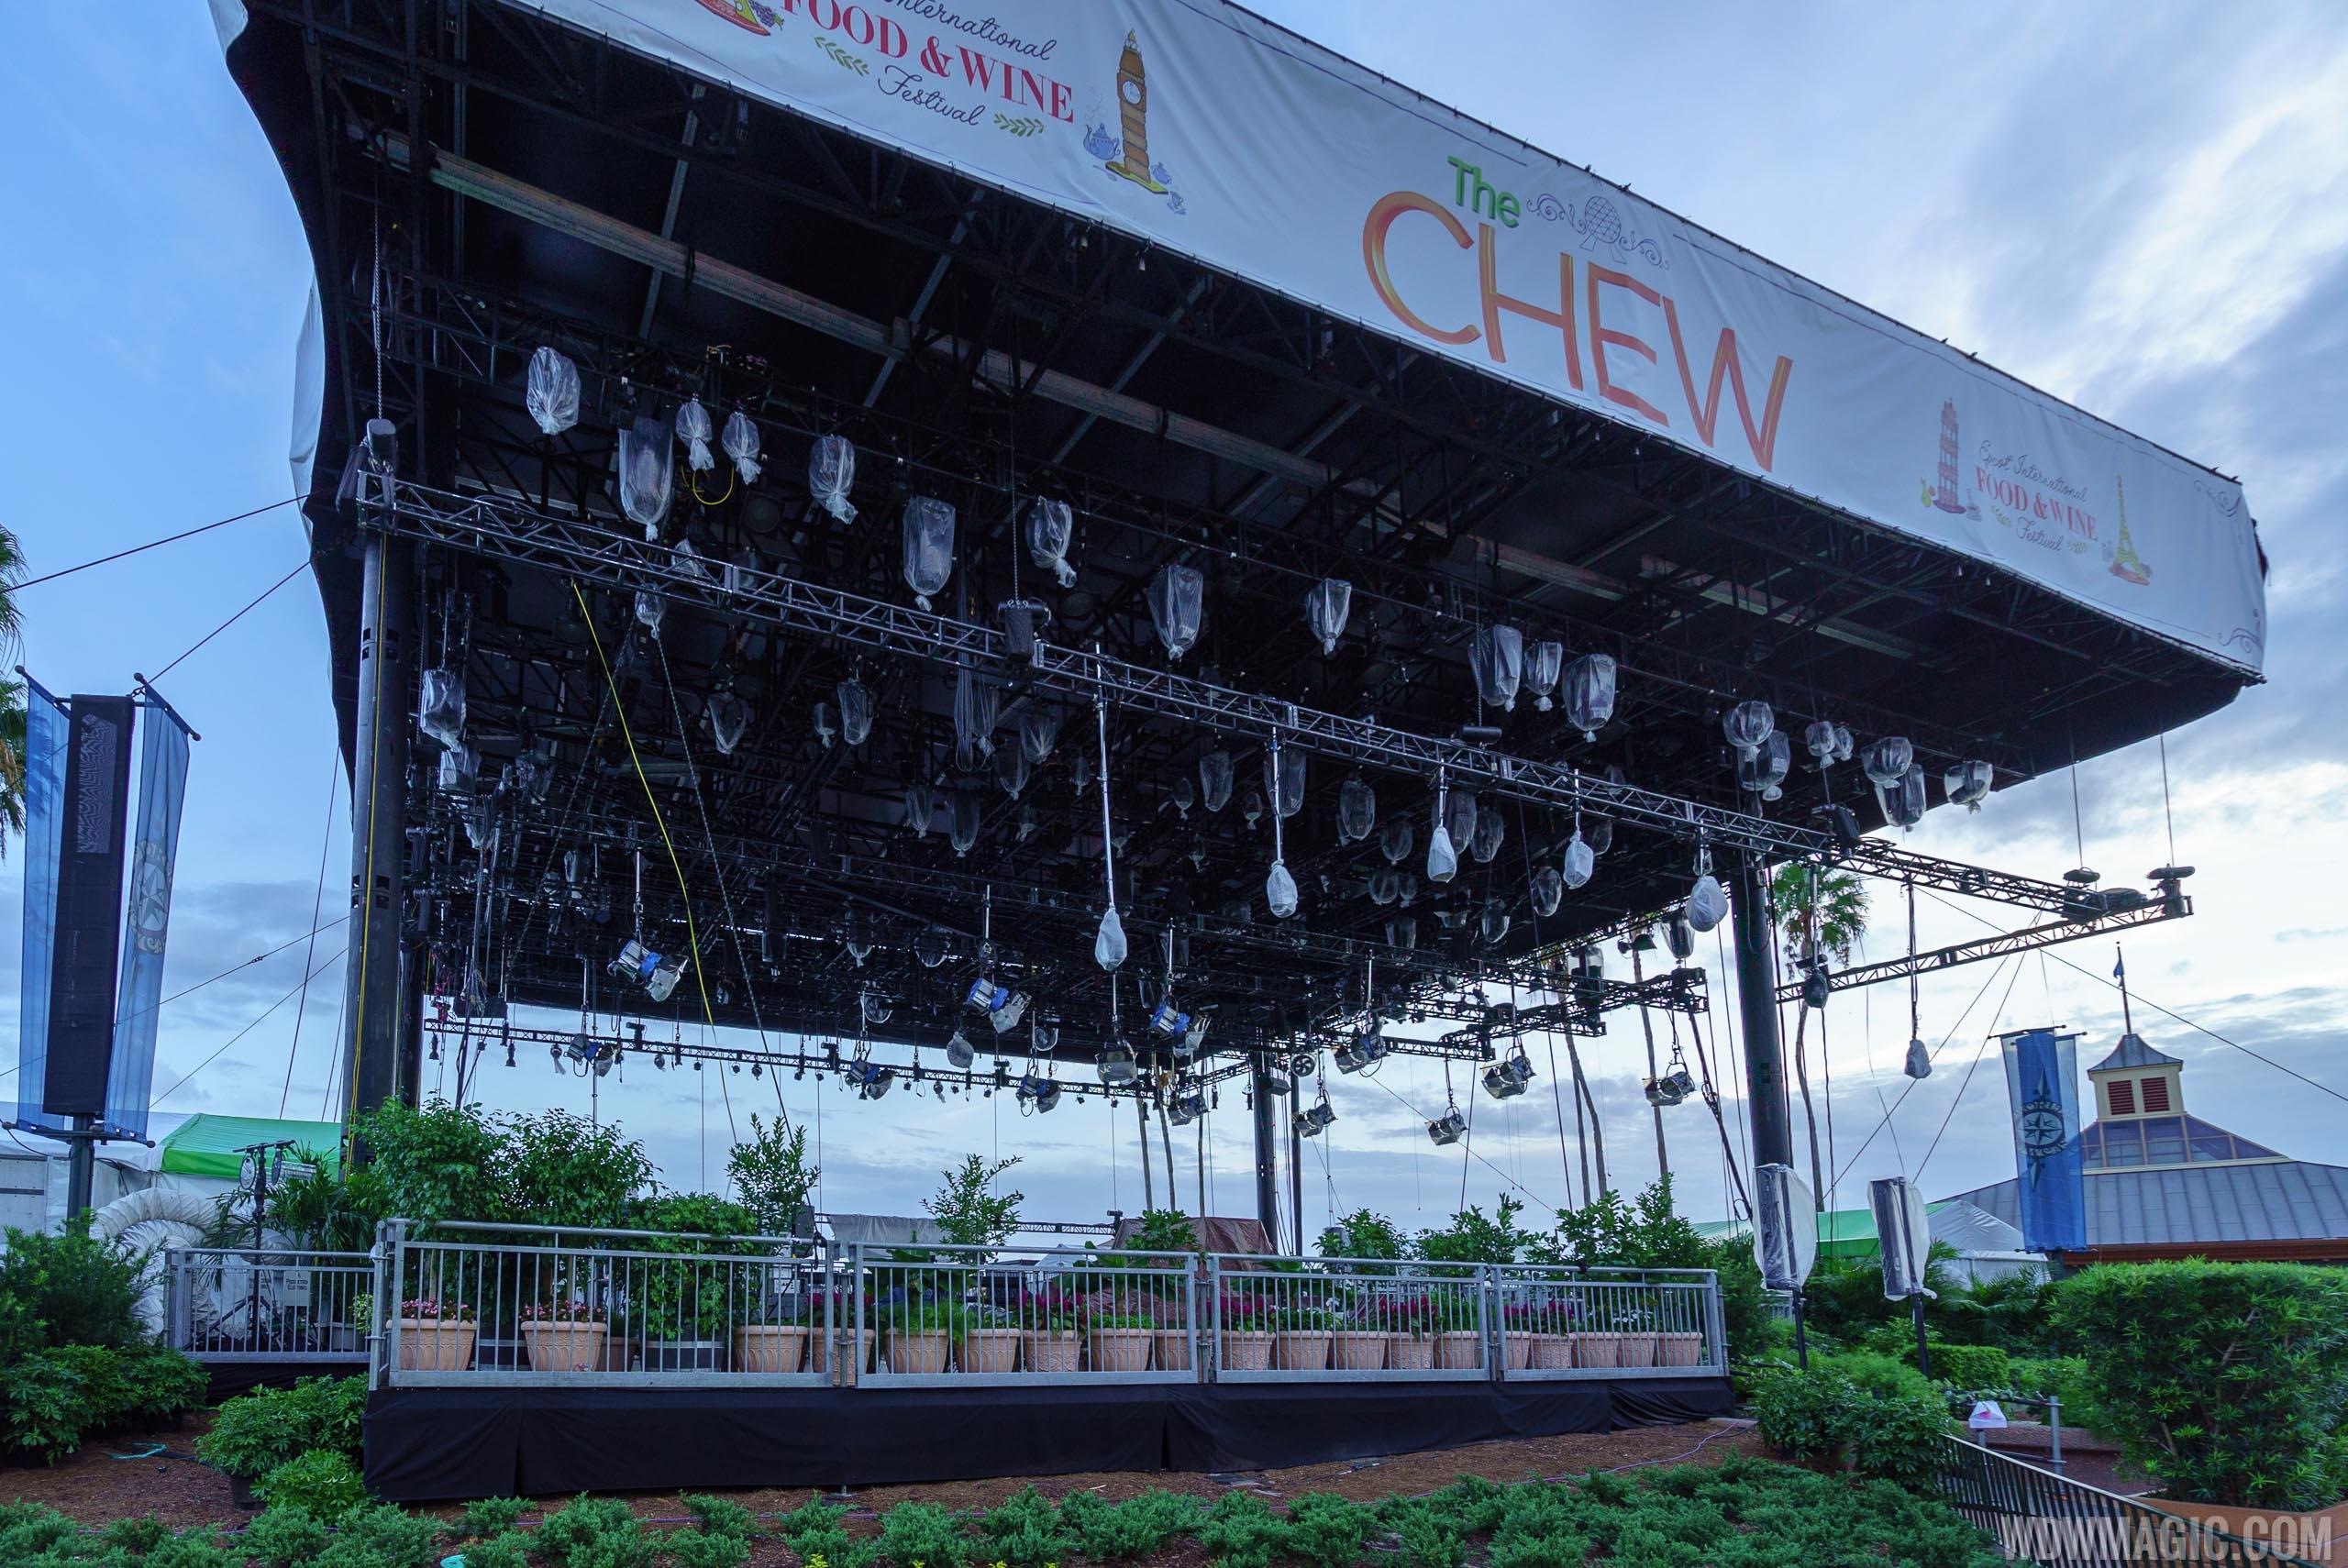 World Showcase Plaza stage